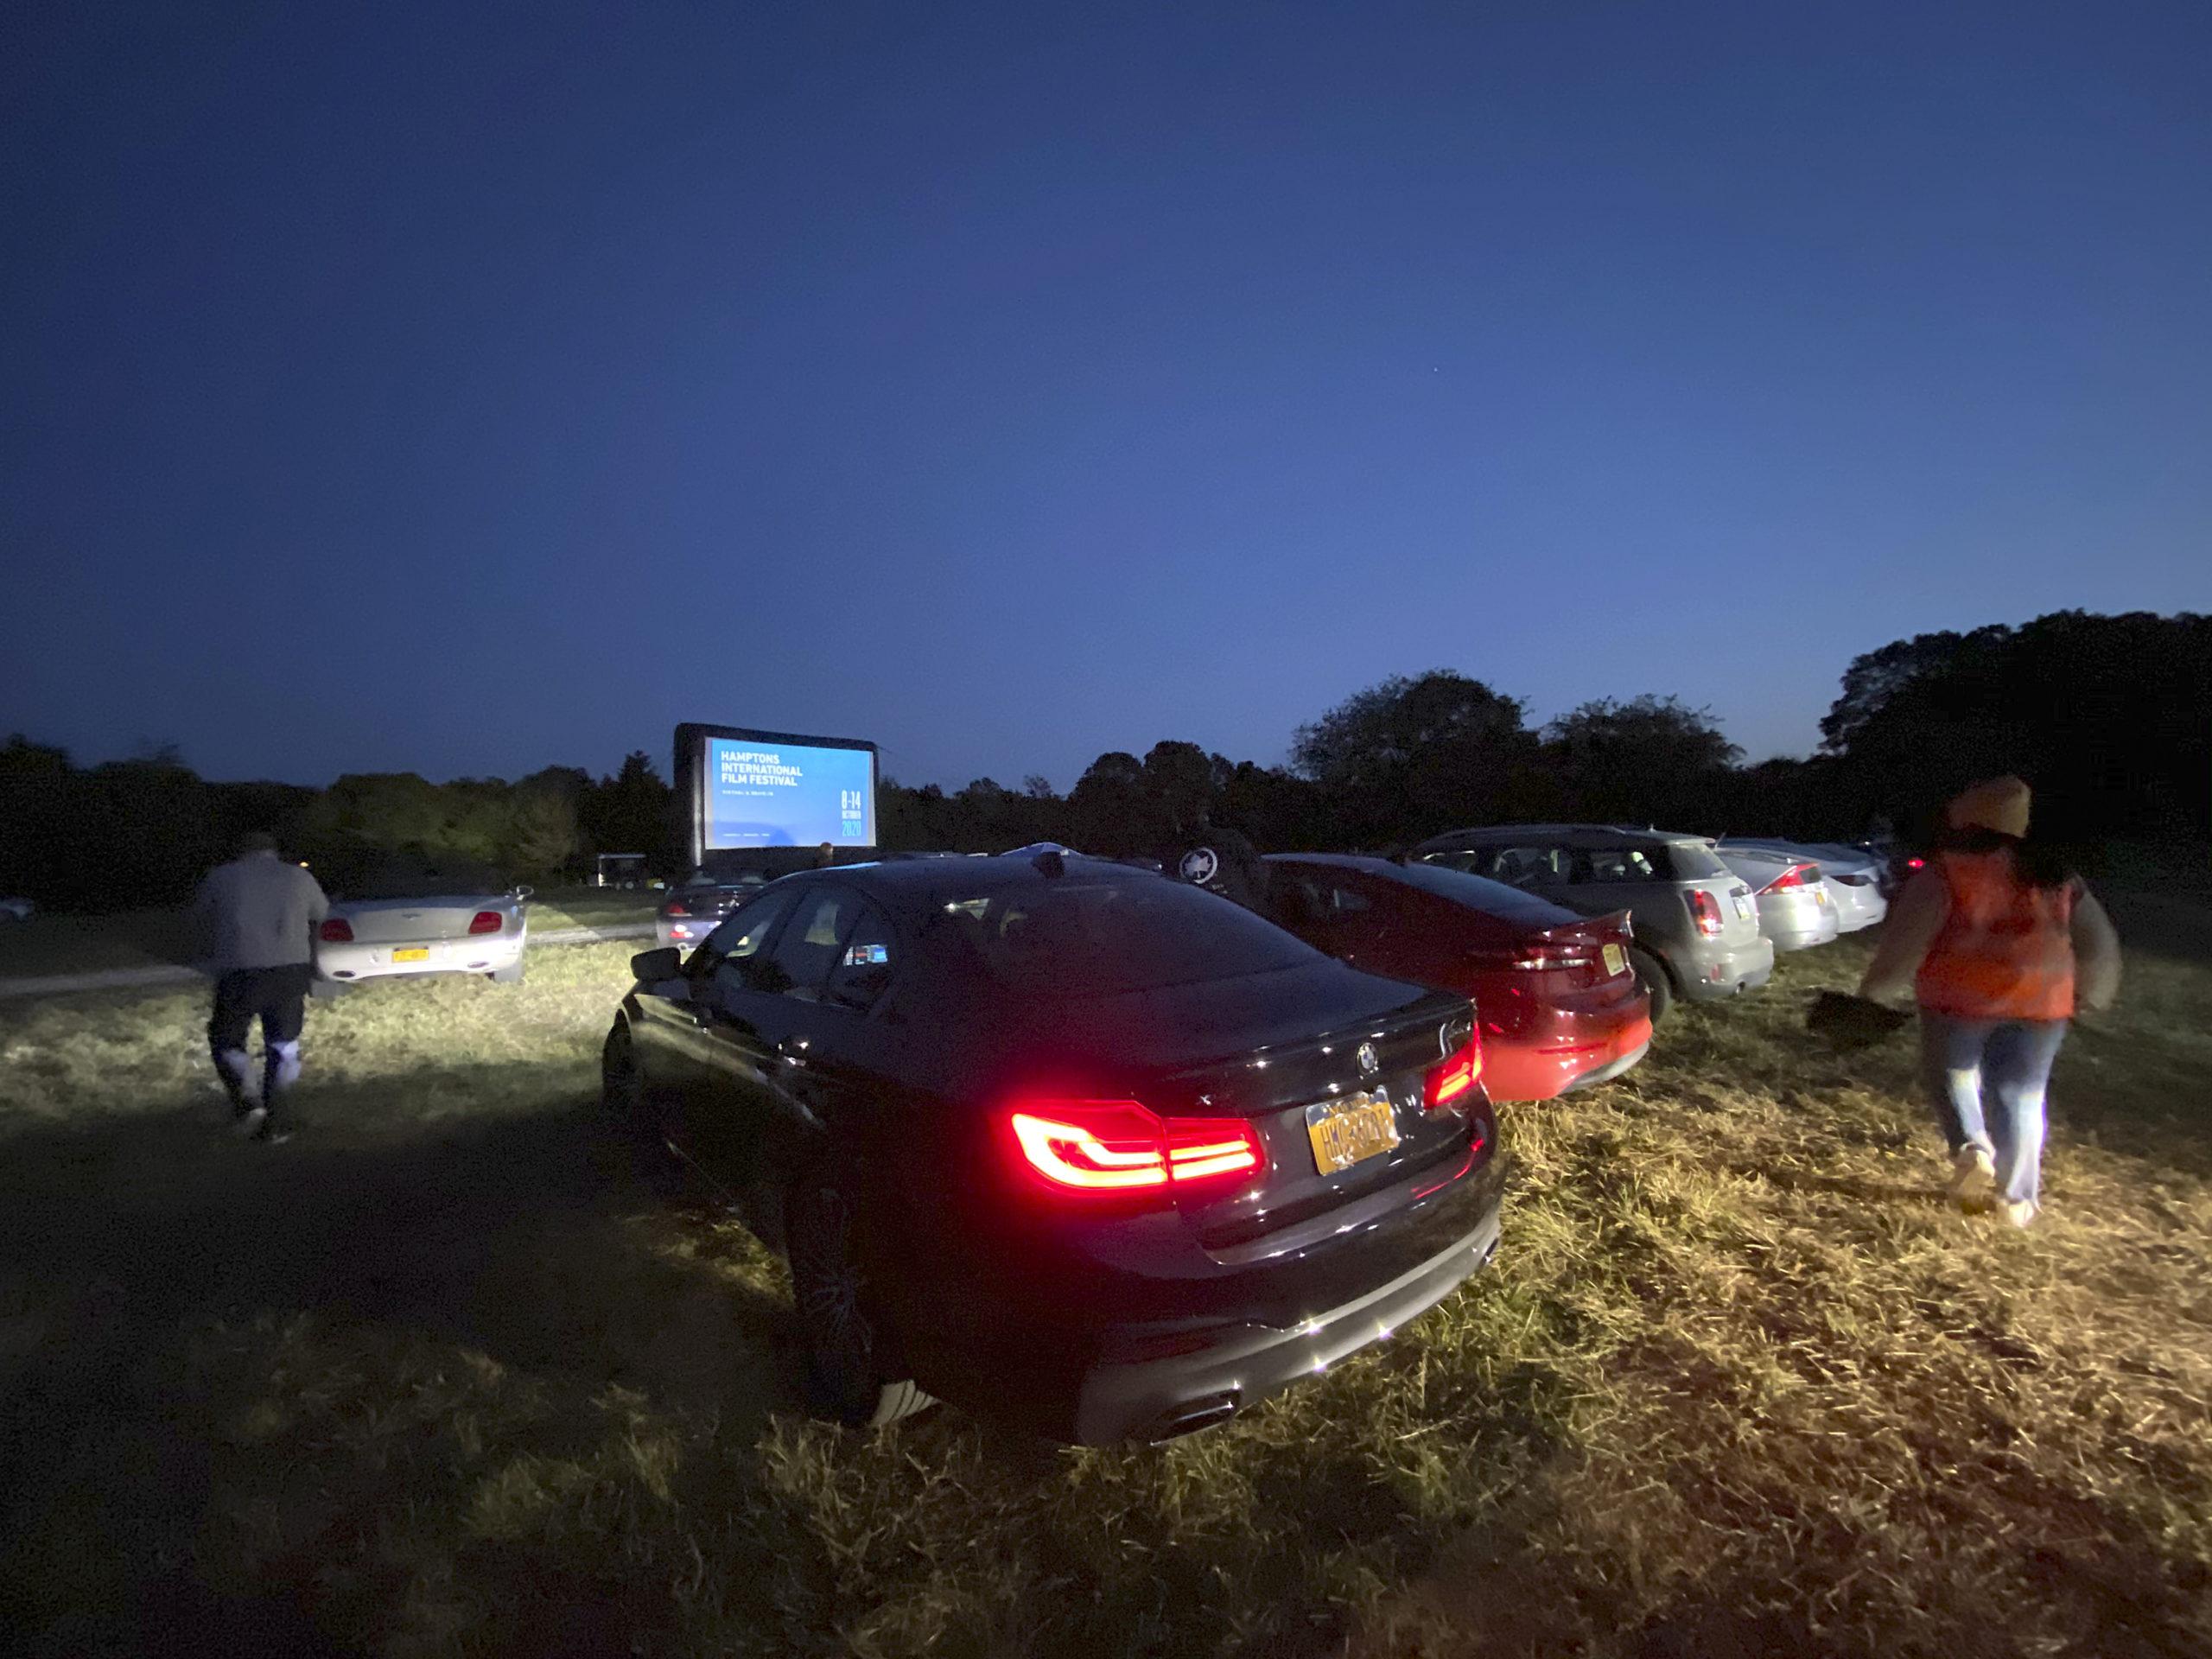 The Hamptons International Film Festival drive-in screening of